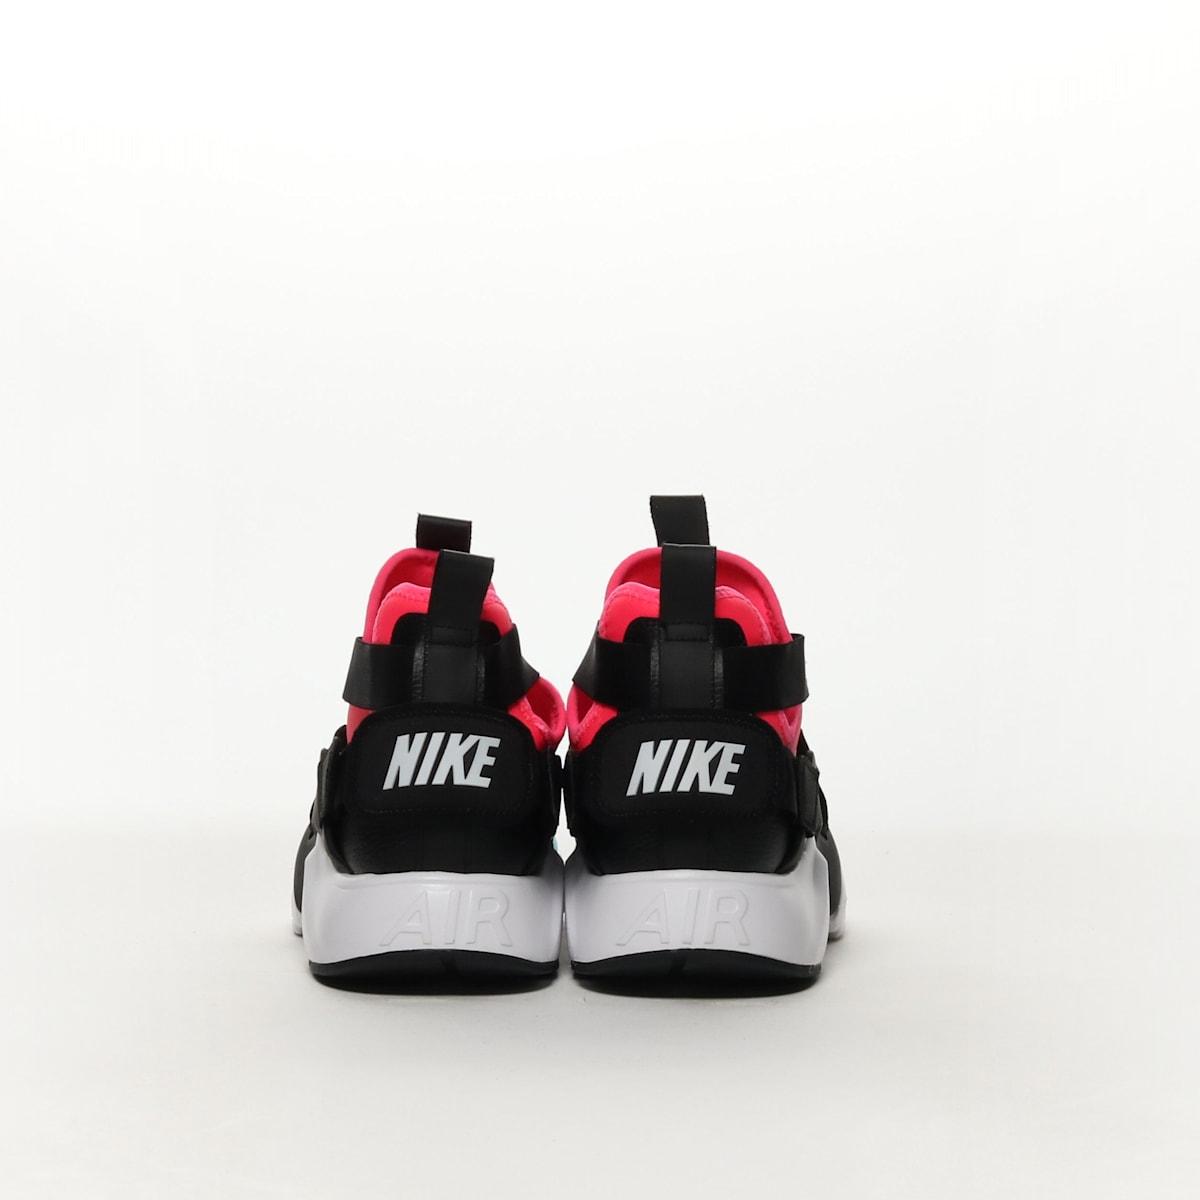 quality design 92c15 796a5 ... nike air huarache city.  Actual Shoe